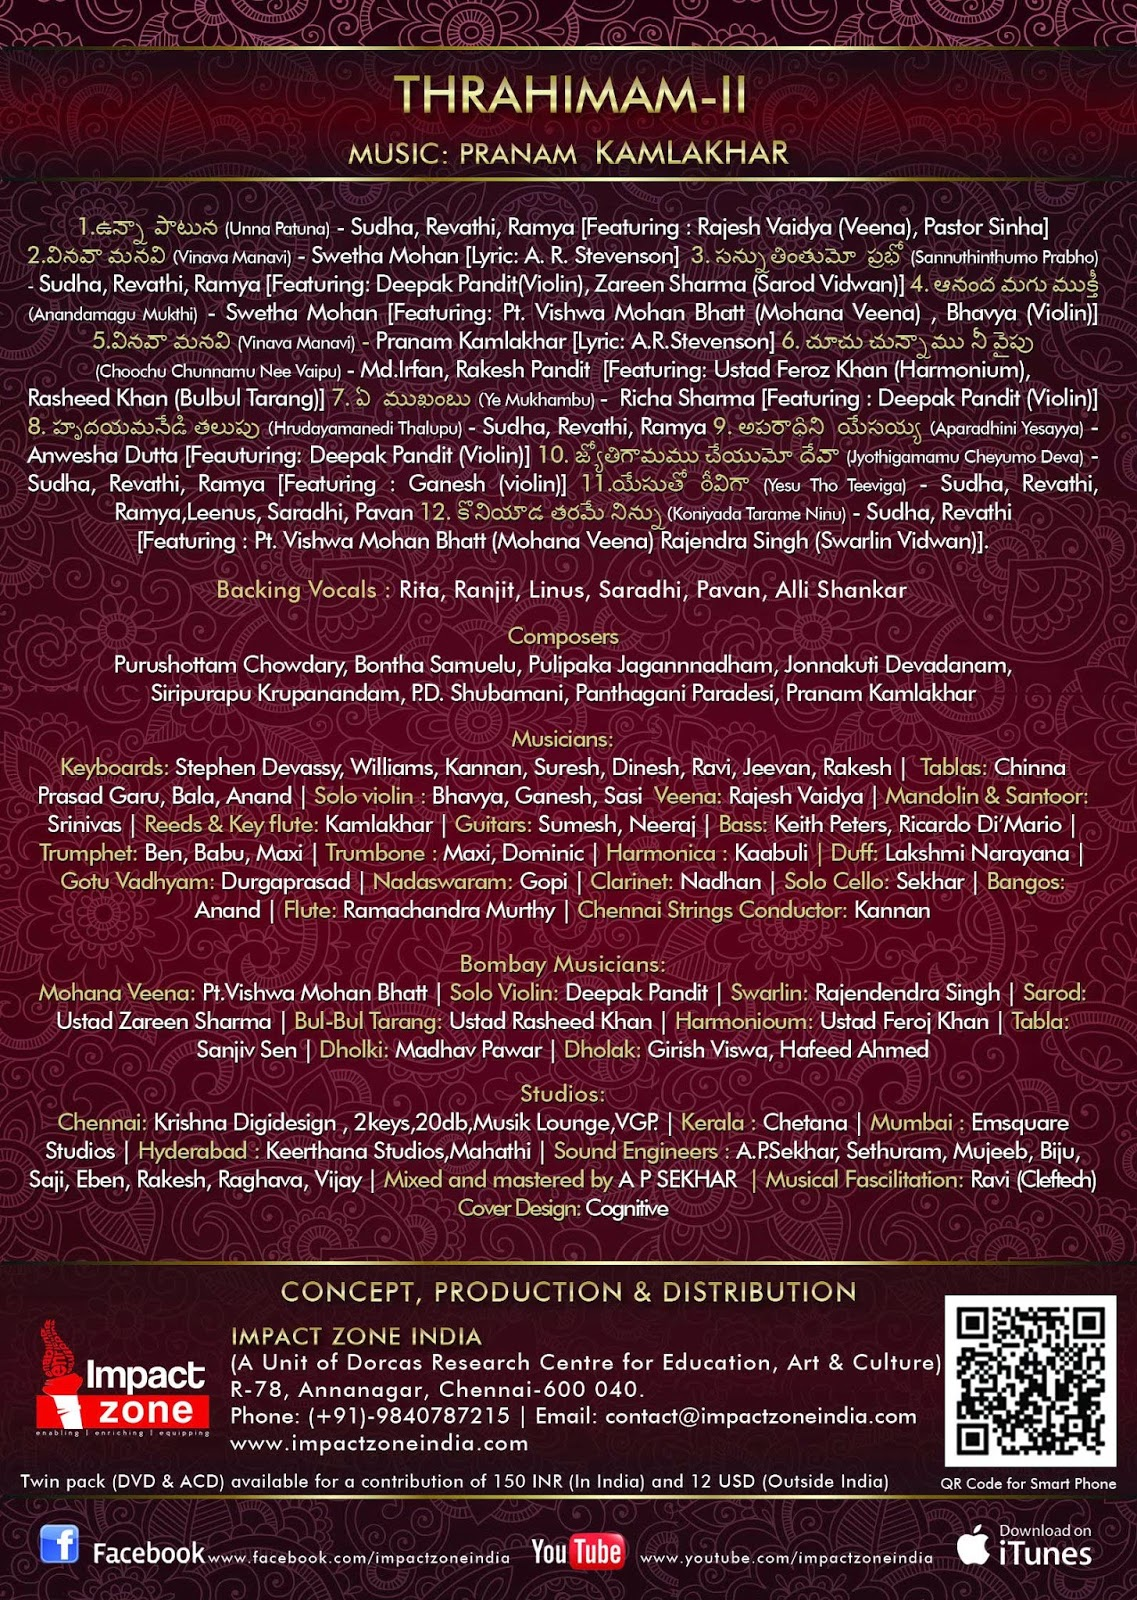 Thrahimam-II-2013-Telugu-Christian-Album-Tracklisting